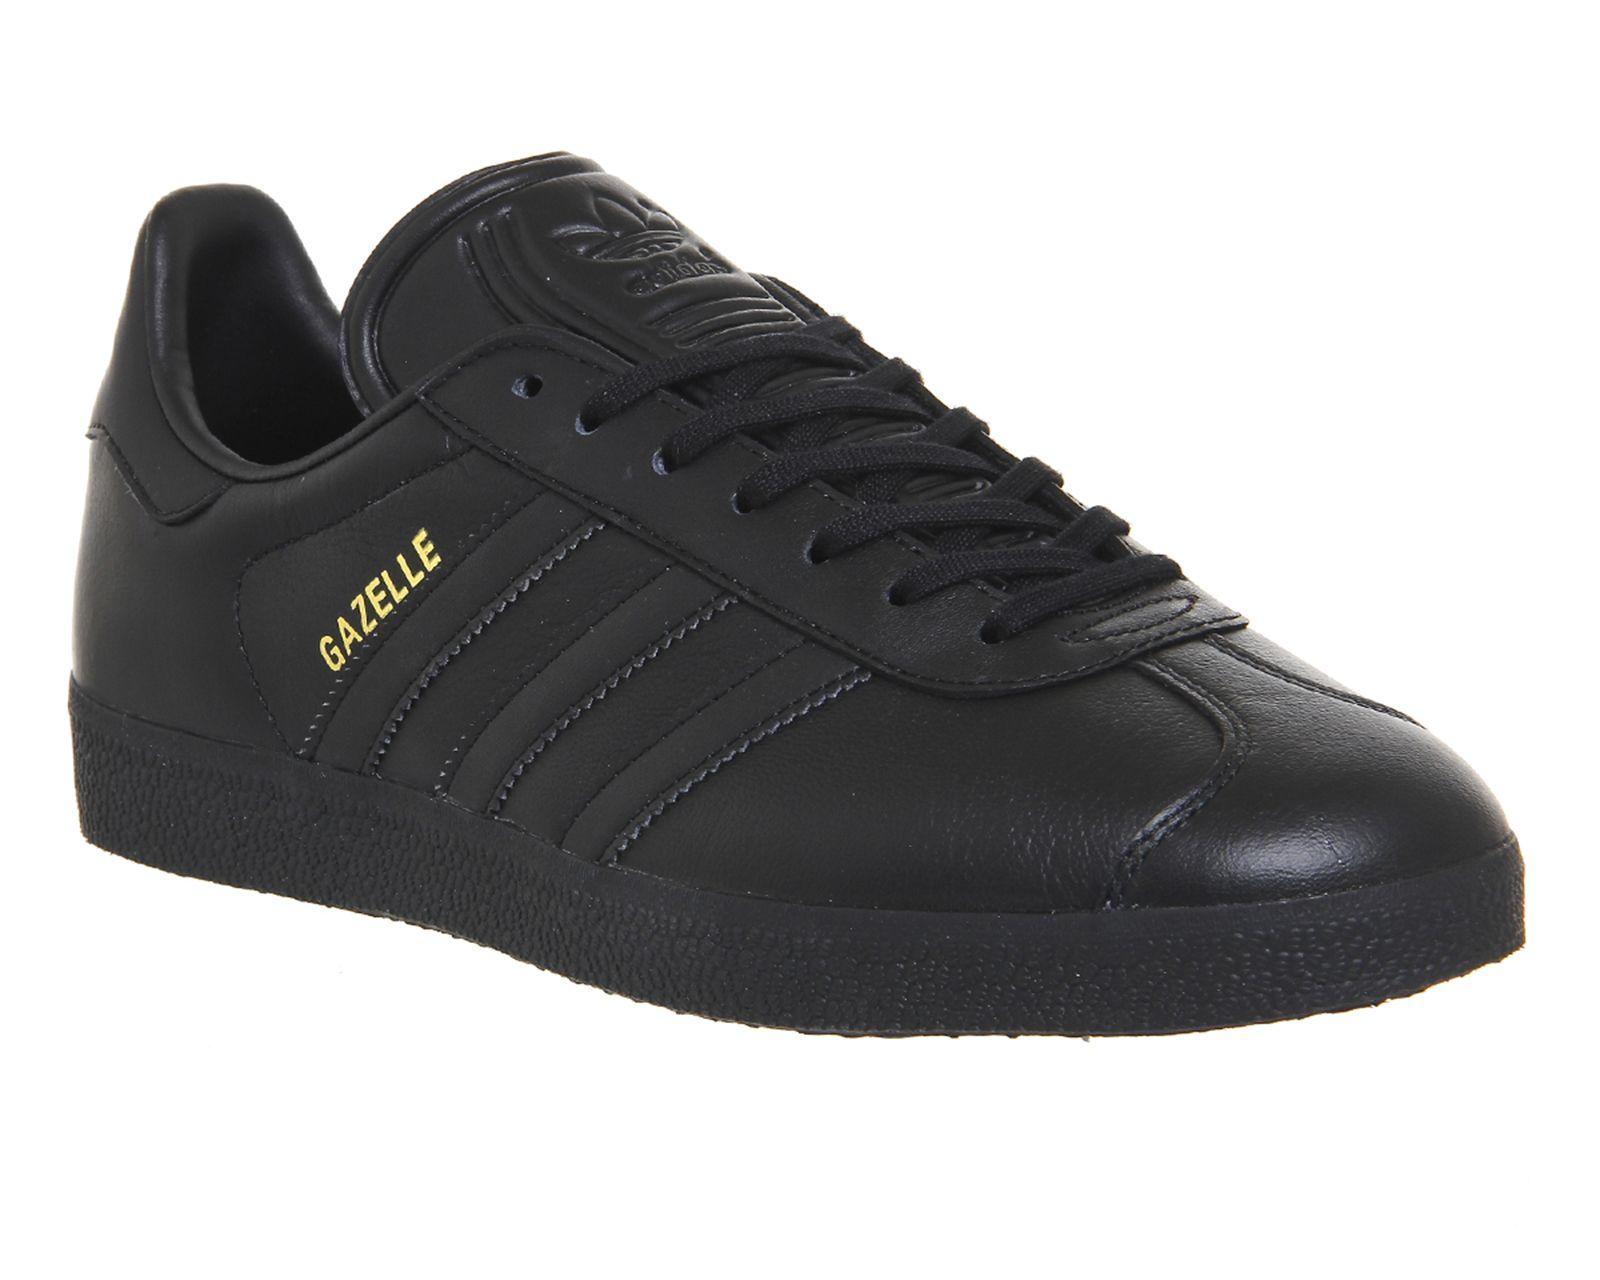 Gazzella scarpe pinterest adidas gazzella, cr ê pes e dei formatori